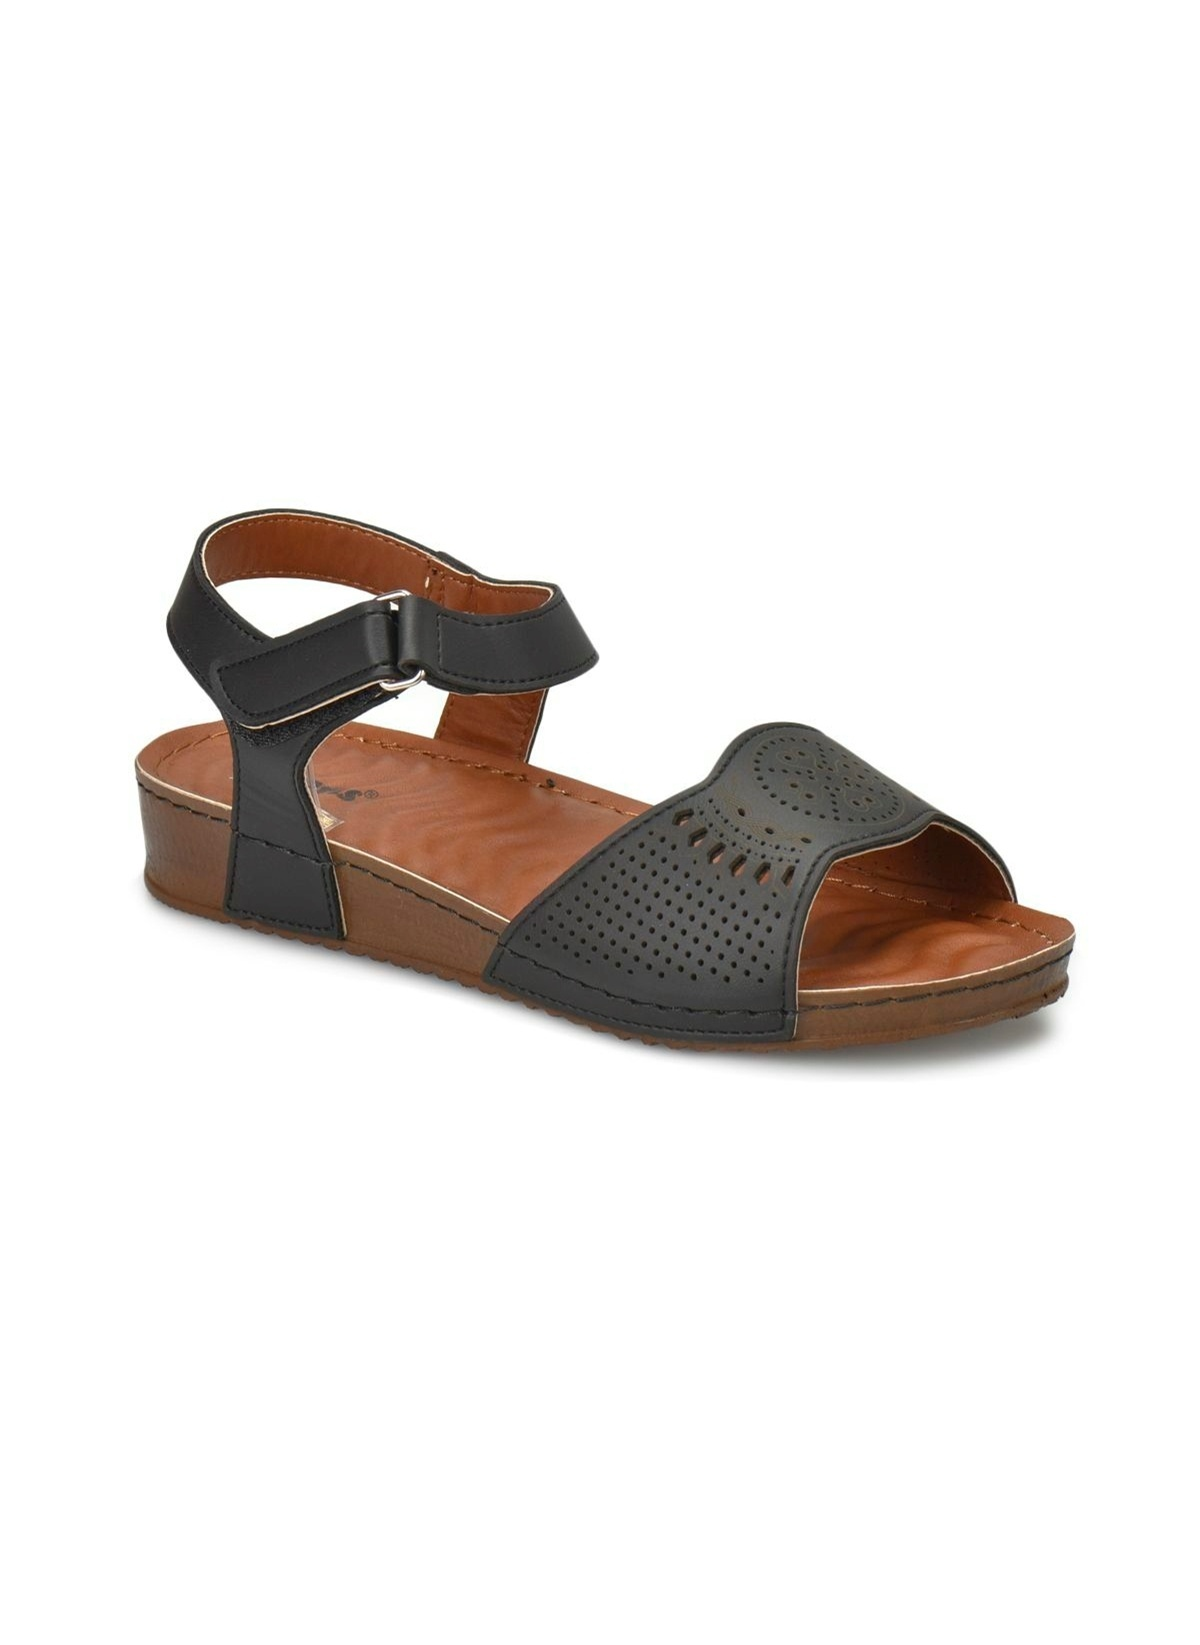 Polaris Sandalet 81.157373.z Basic Comfort – 59.99 TL